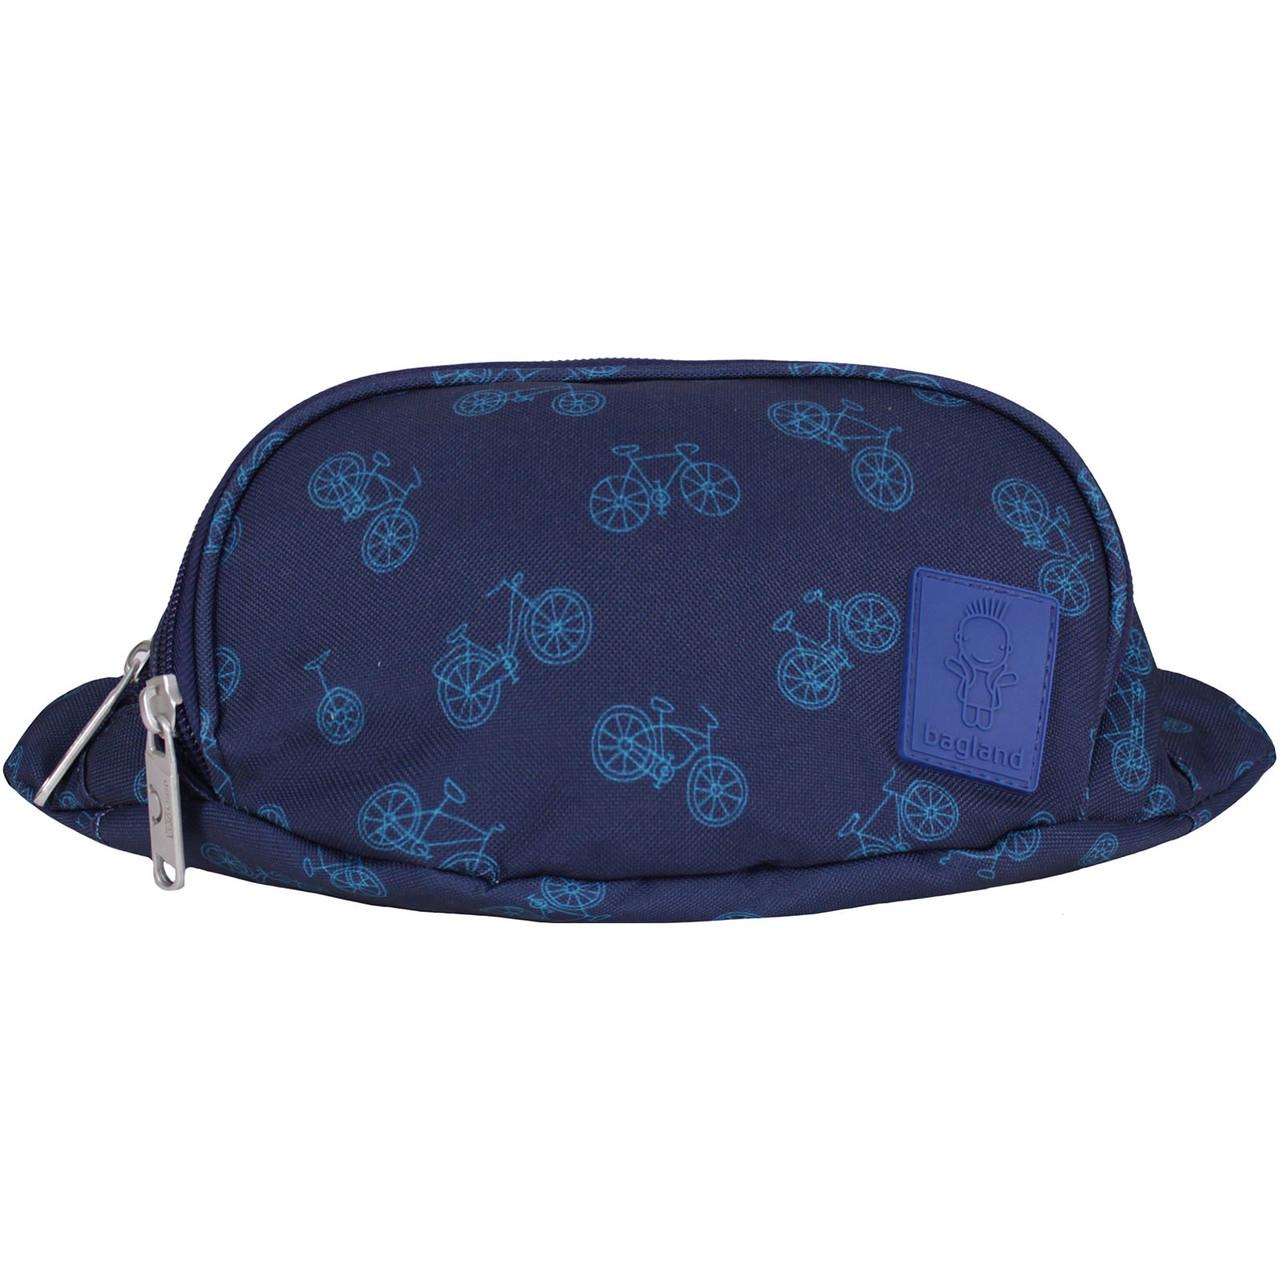 ea059ae55fe5 Барсетка сумка на пояс , поясная сумочка Bagland Bella : продажа ...